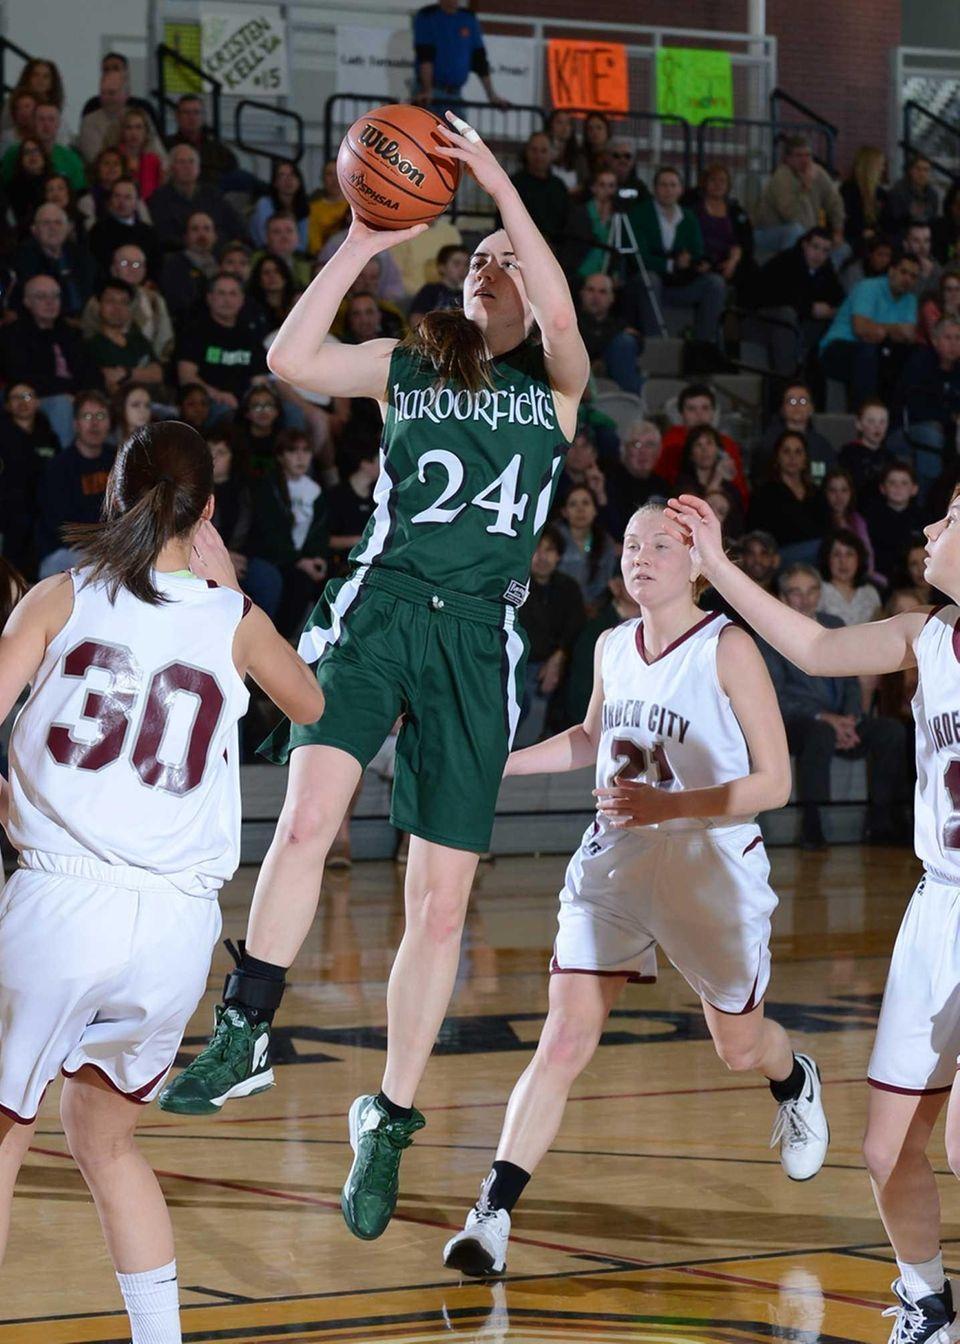 Harborfield's Bridget Ryan goes up for the jump